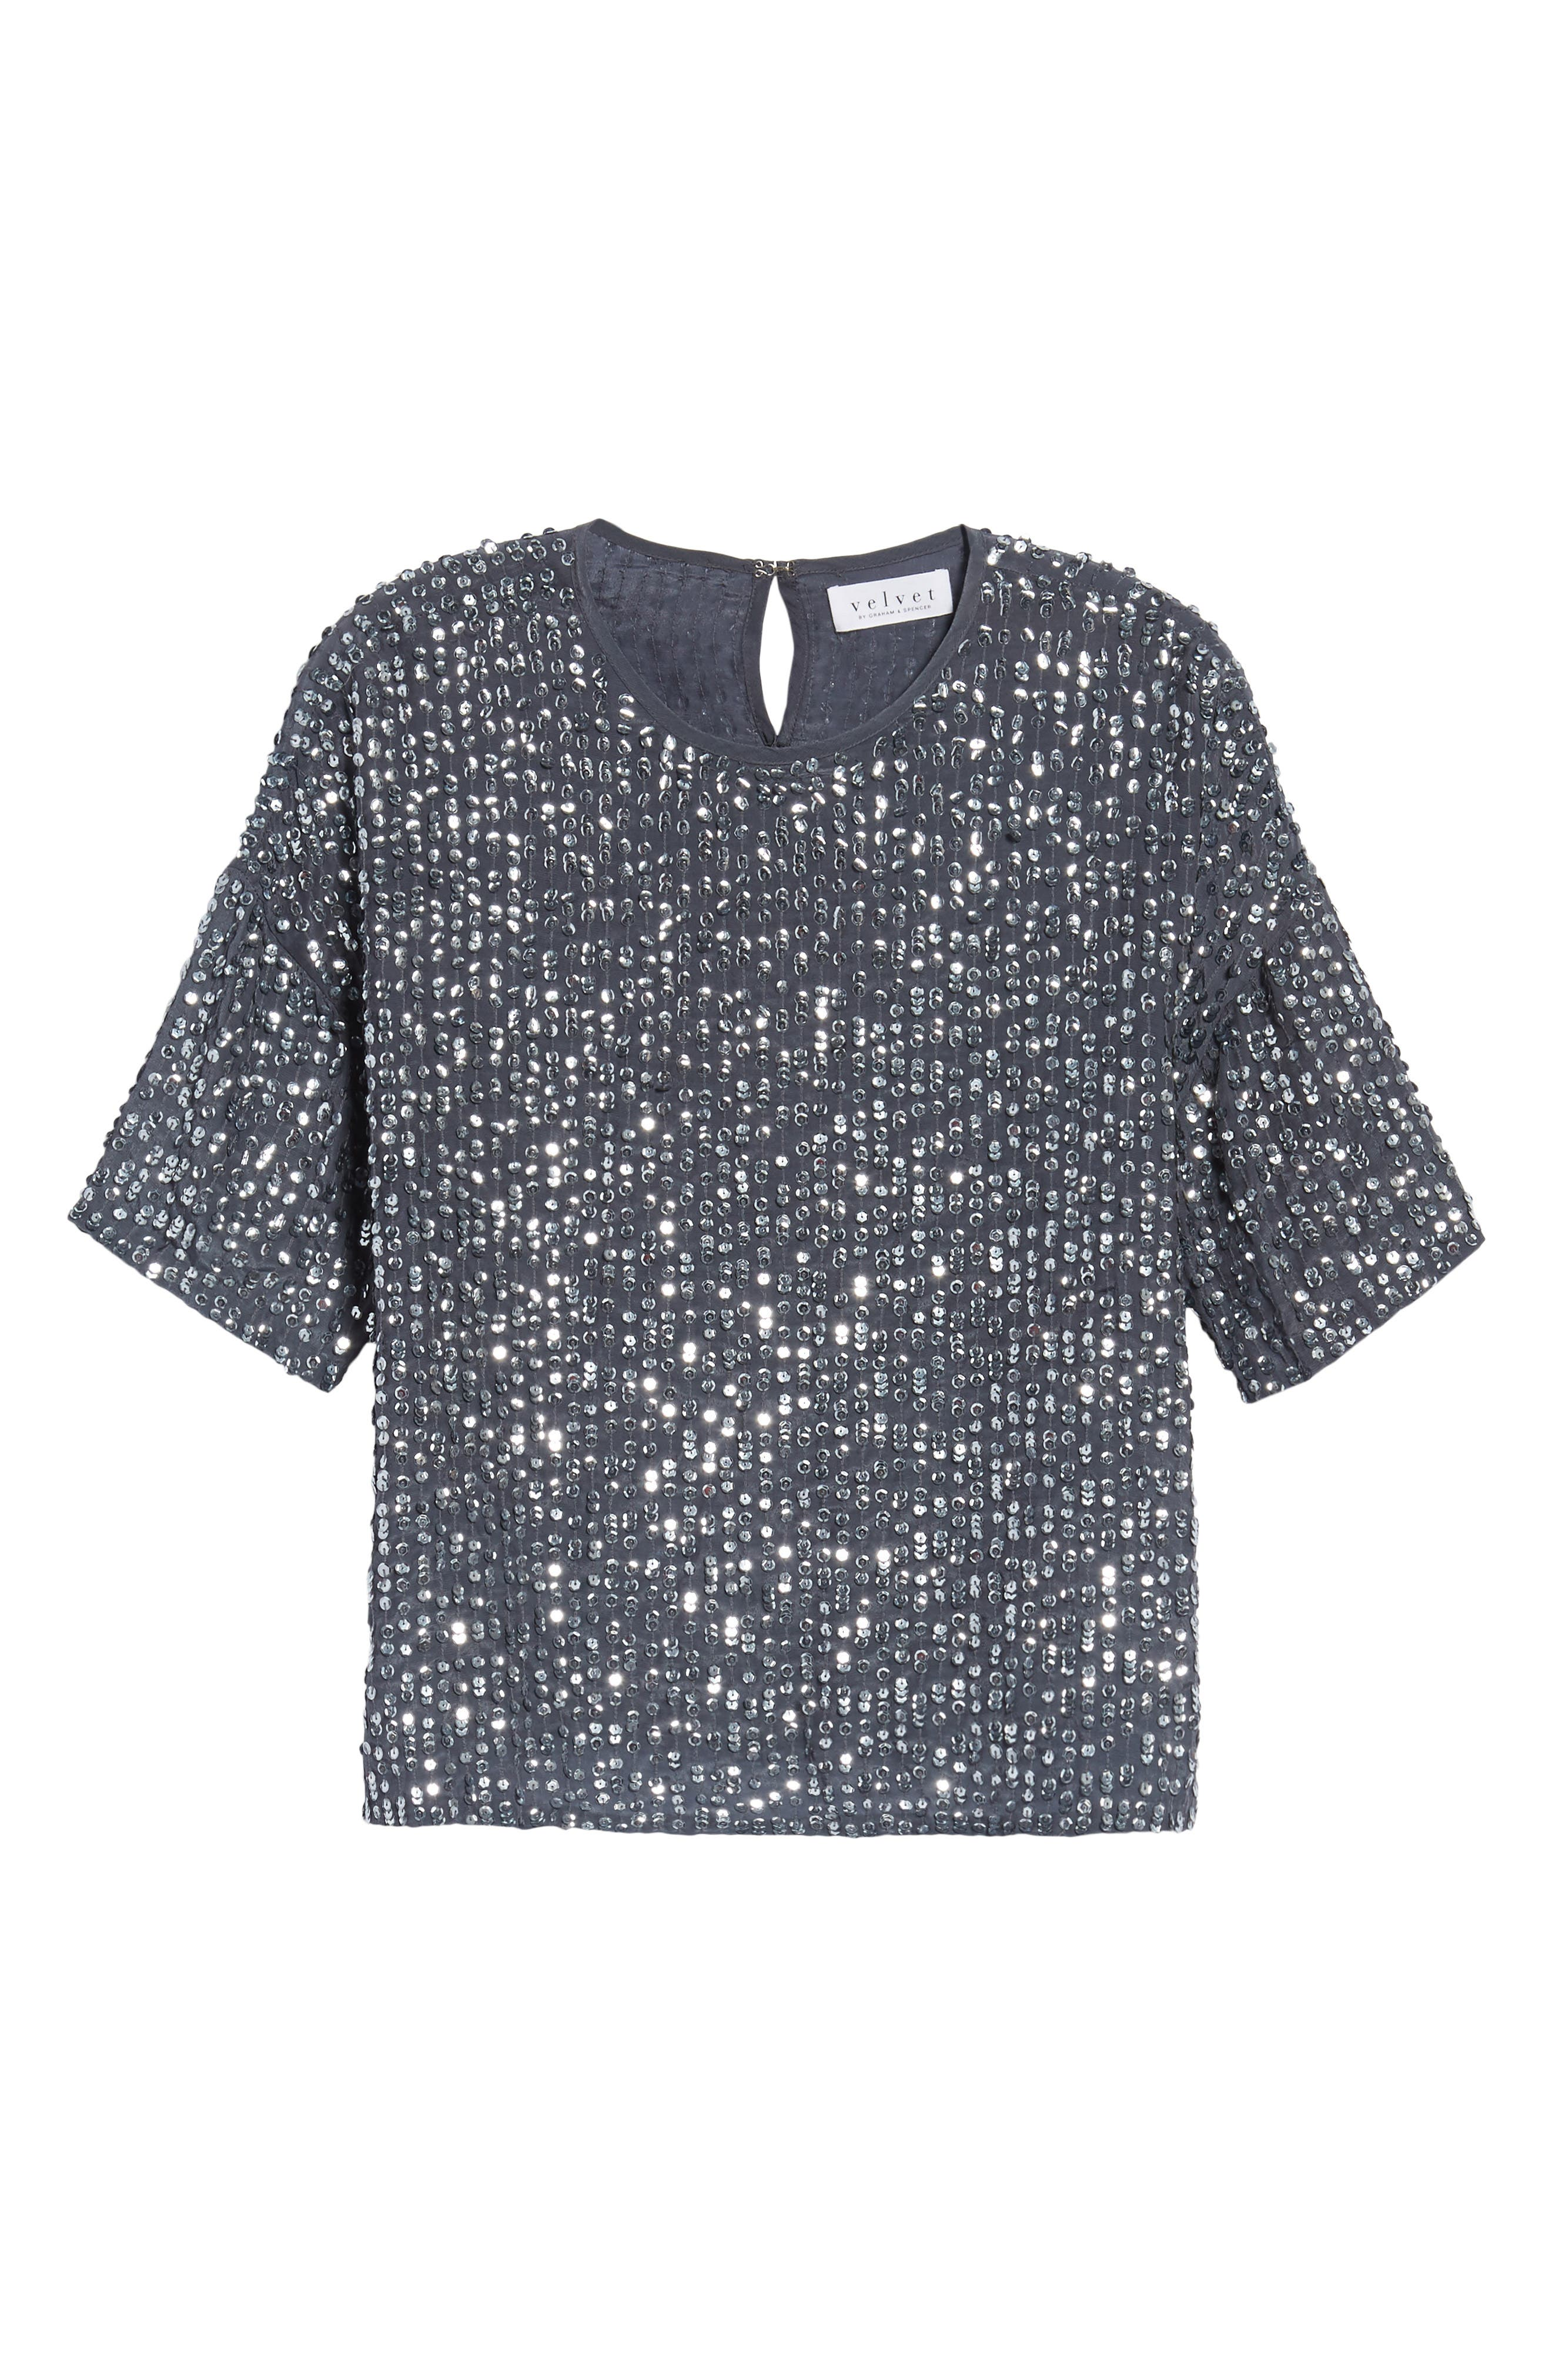 Short Sleeve Sequin Top,                             Alternate thumbnail 6, color,                             031